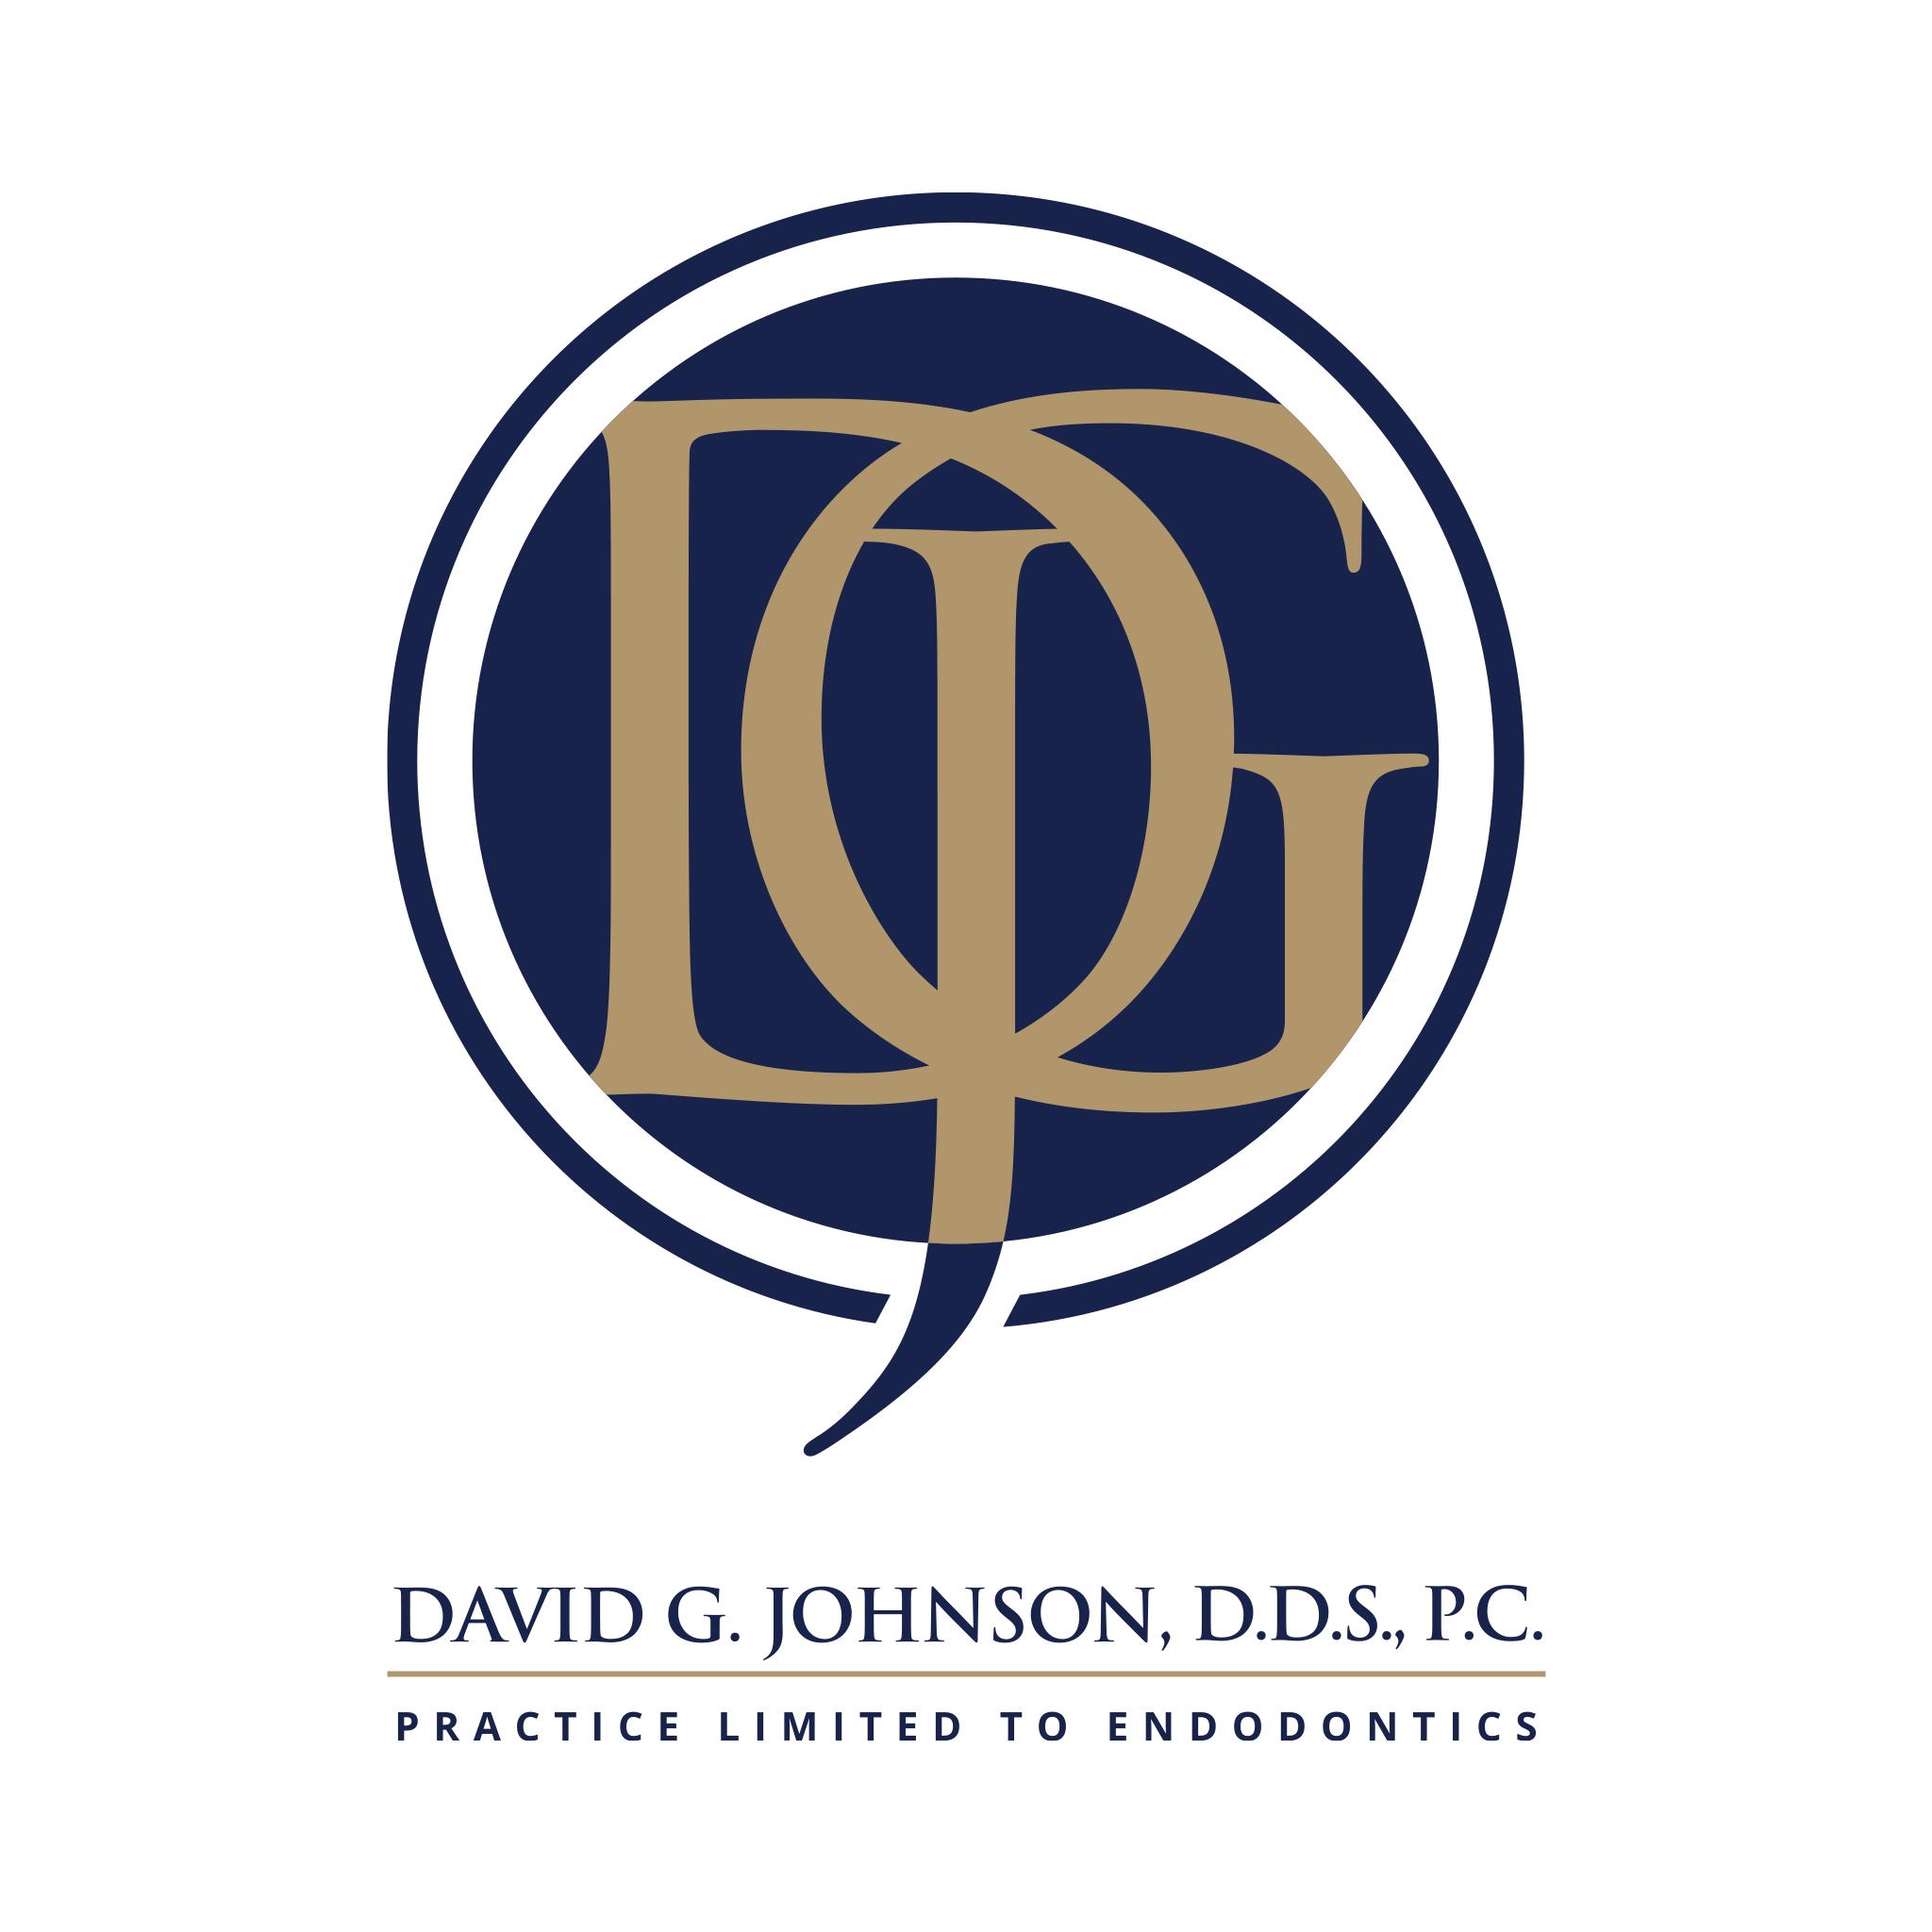 David G. Johnson DDS PC